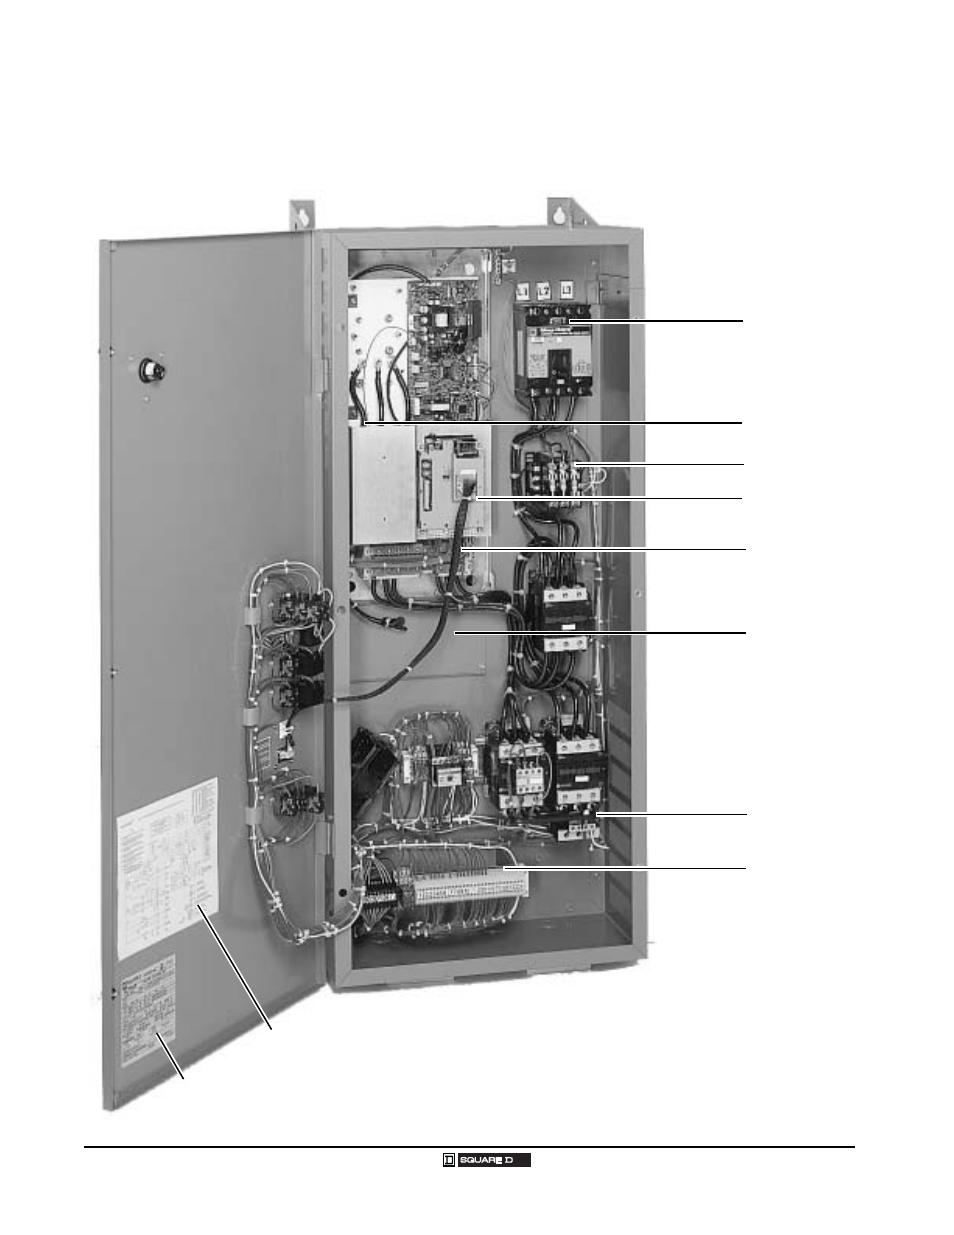 Component Locations Continued Class 8839 Econoflex Ac Drives Schneider Electric Transformer Wiring Diagram Altivar 58 Trx User Manual Page 193 232